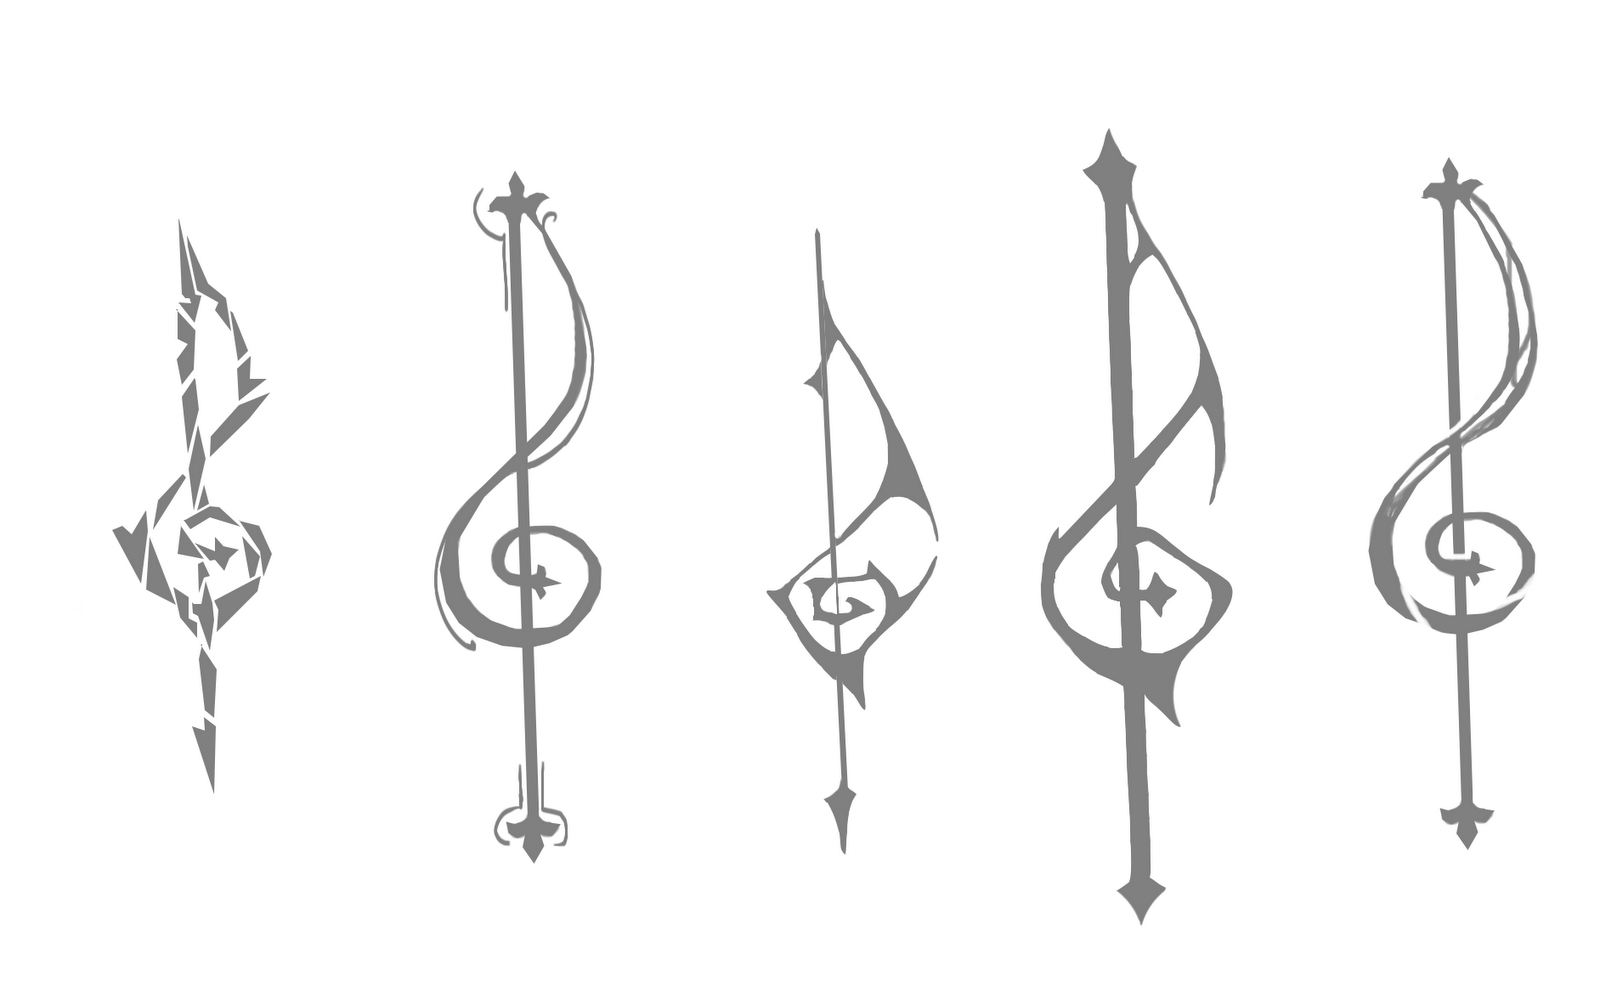 http://4.bp.blogspot.com/-fdtwZjnXuIY/T2O5VD6AzVI/AAAAAAAAAMg/SQYpE-nKWHs/s1600/clefs2.png